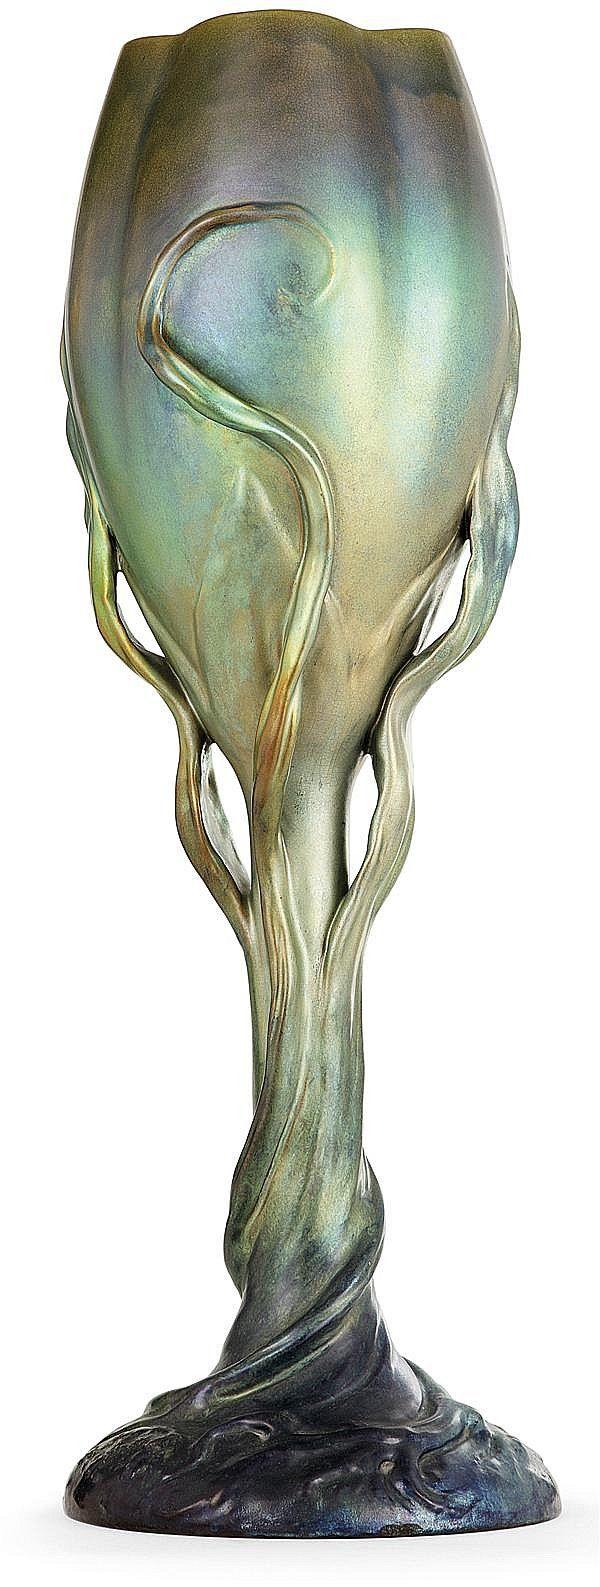 Zsolnay, Pécs, Eosin-Glaze Decorated Earthenware Vase | JV